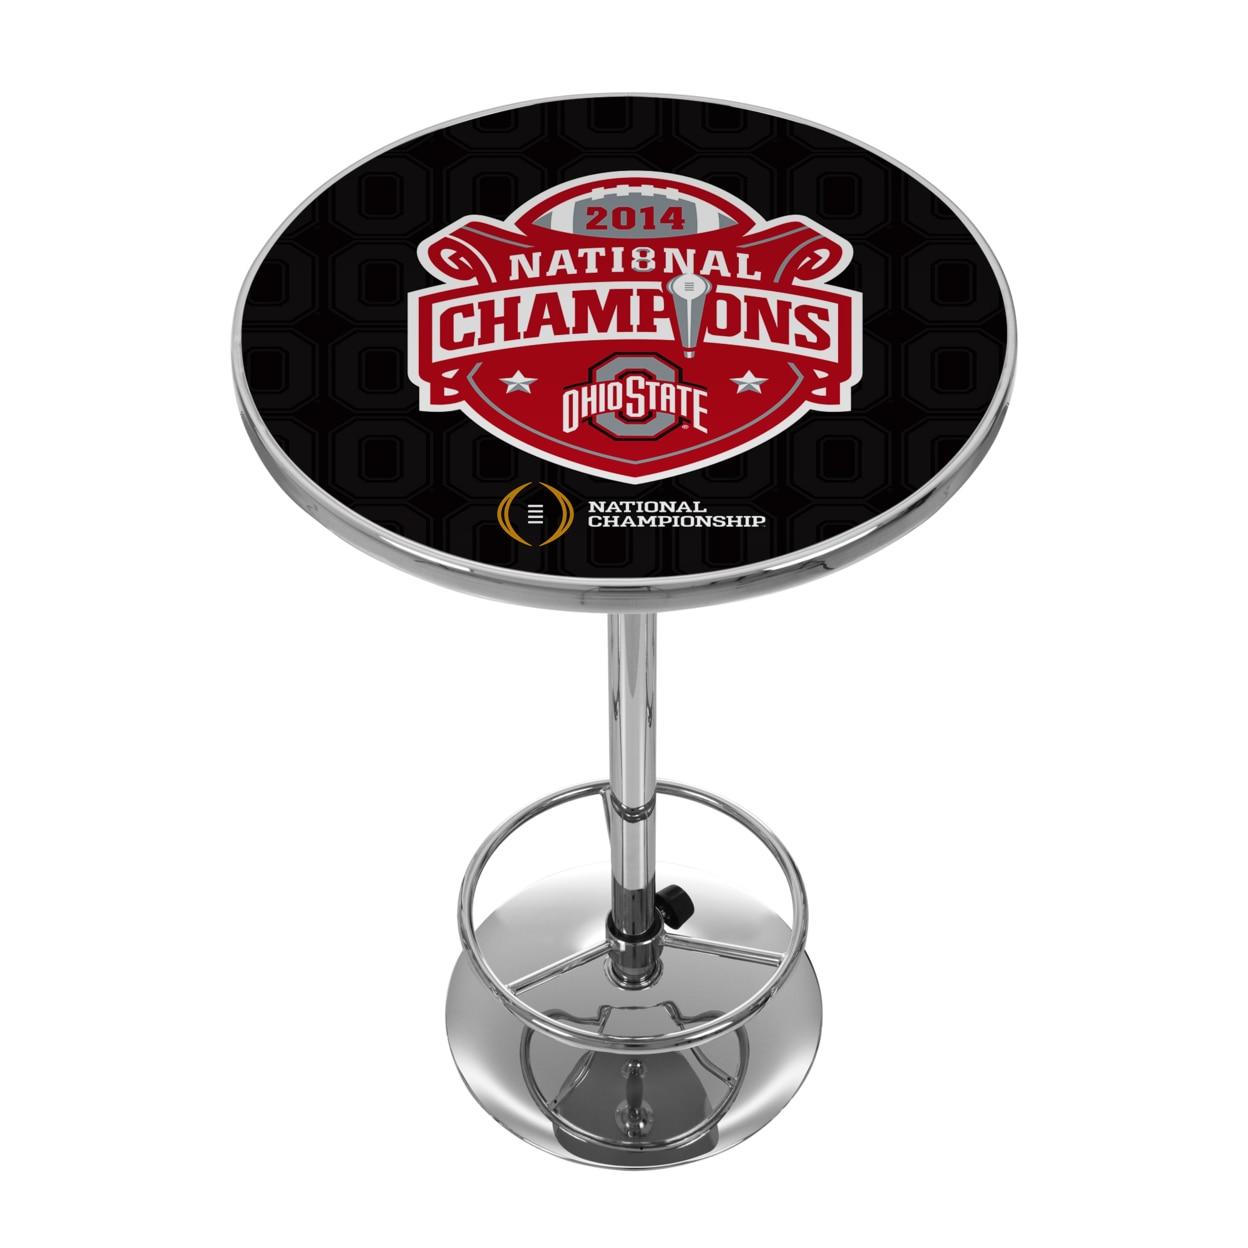 Ohio State University National Champions Chrome 42 Inch Pub Table - Fade ботинки meindl meindl ohio 2 gtx® женские